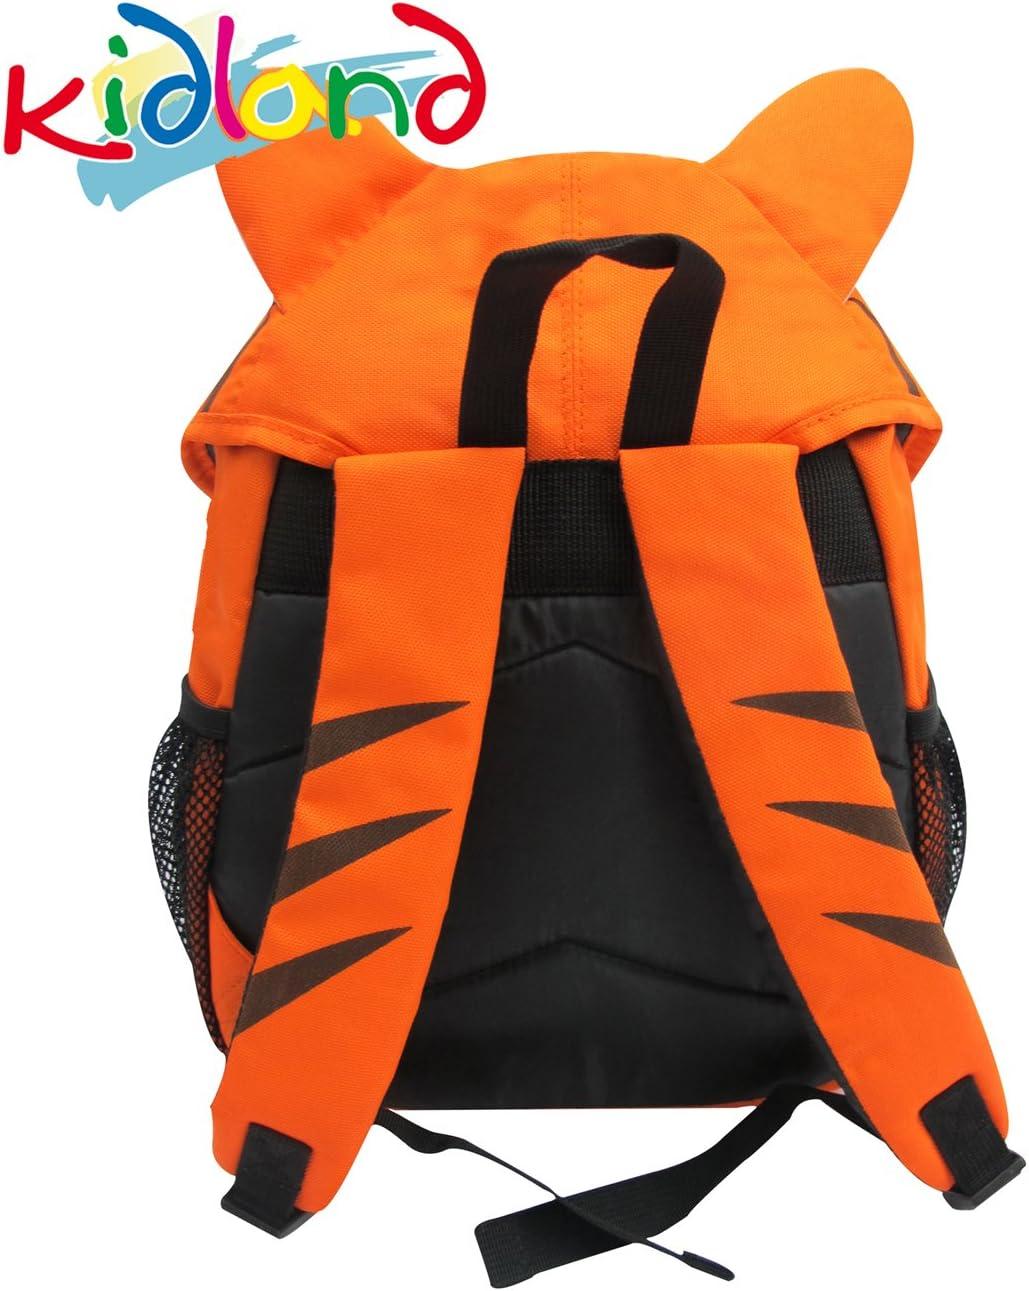 Kidland *Giraffe* Animal Kids boys girls Toddler Backpack//Rucksacks,1-6 years